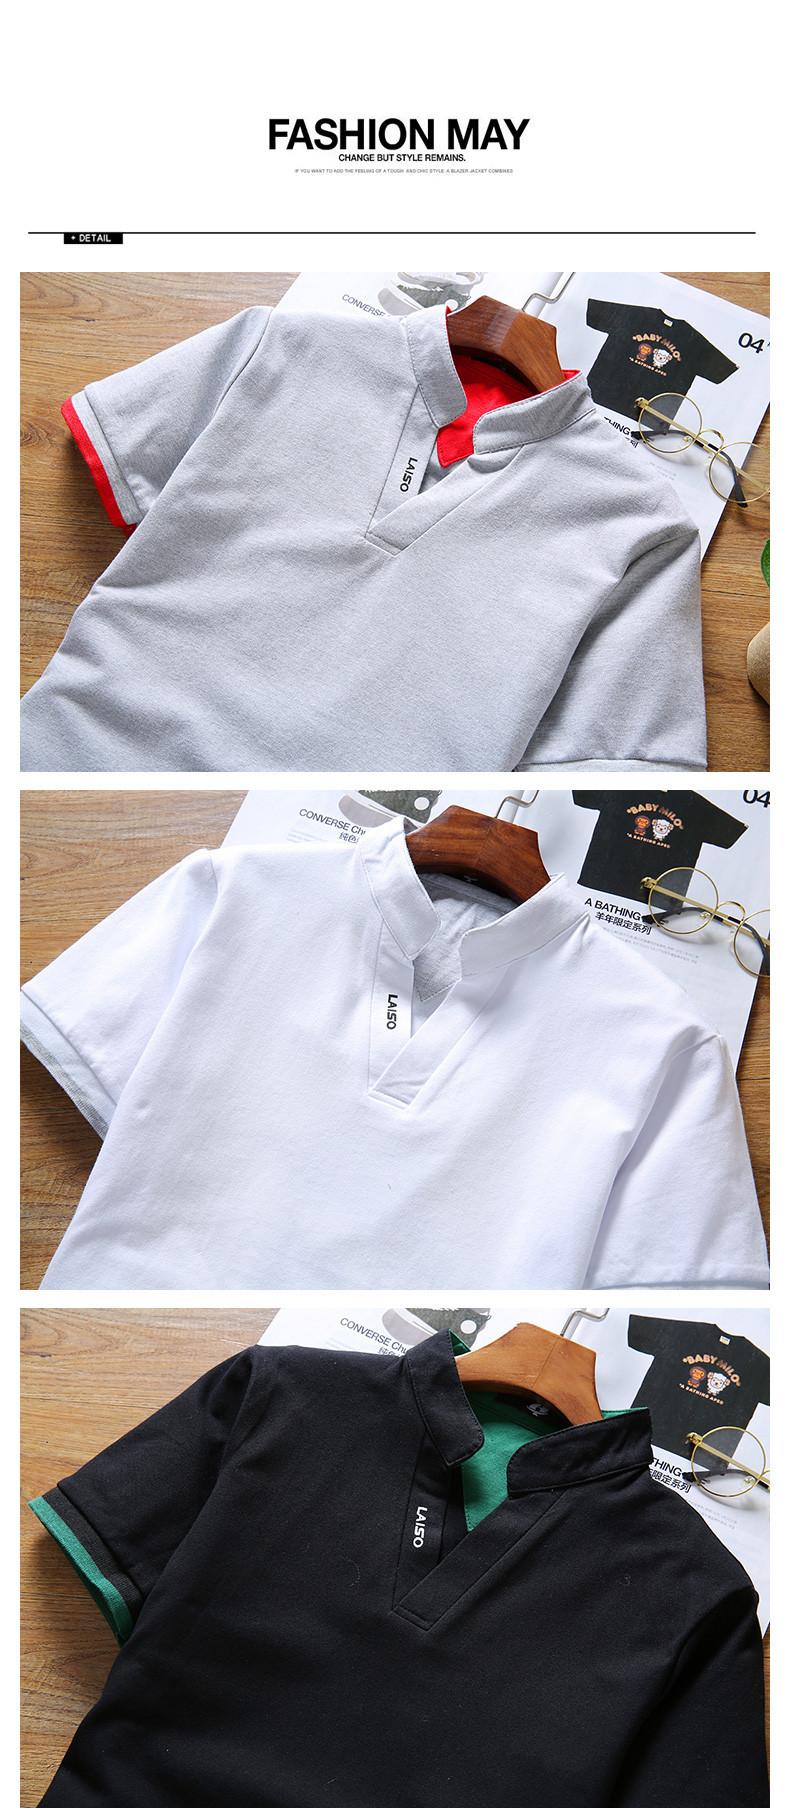 2019 New Arrival Cotton Men Polo Shirt Tops Fashion Brand Plus Size Short Sleeve Black White Polo Shirt Homme Camisa 5XL 20